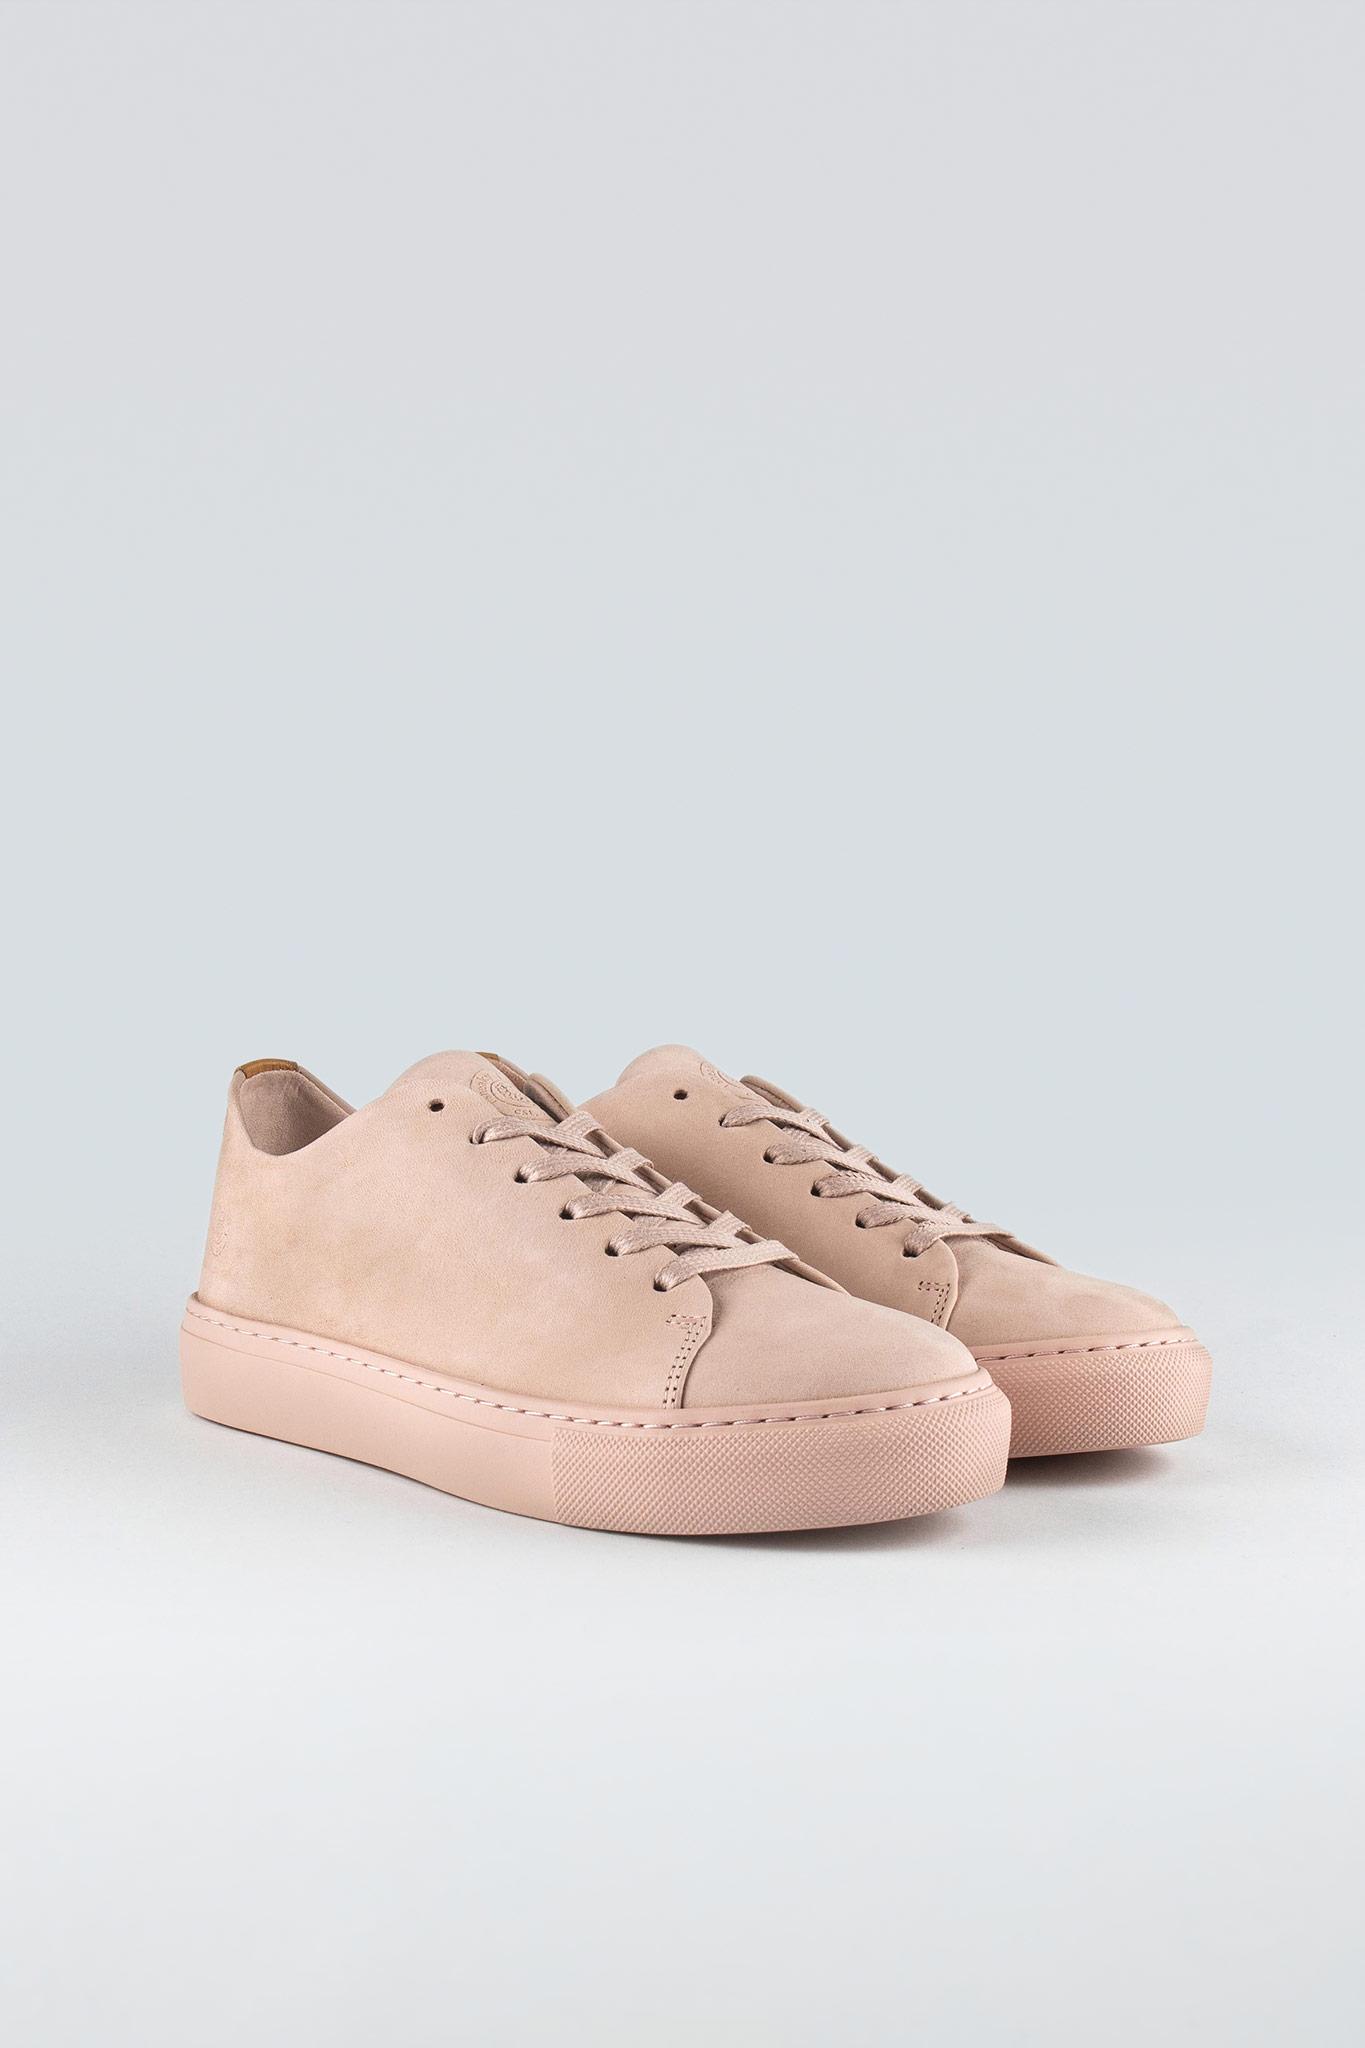 Less W Nubuck Pink